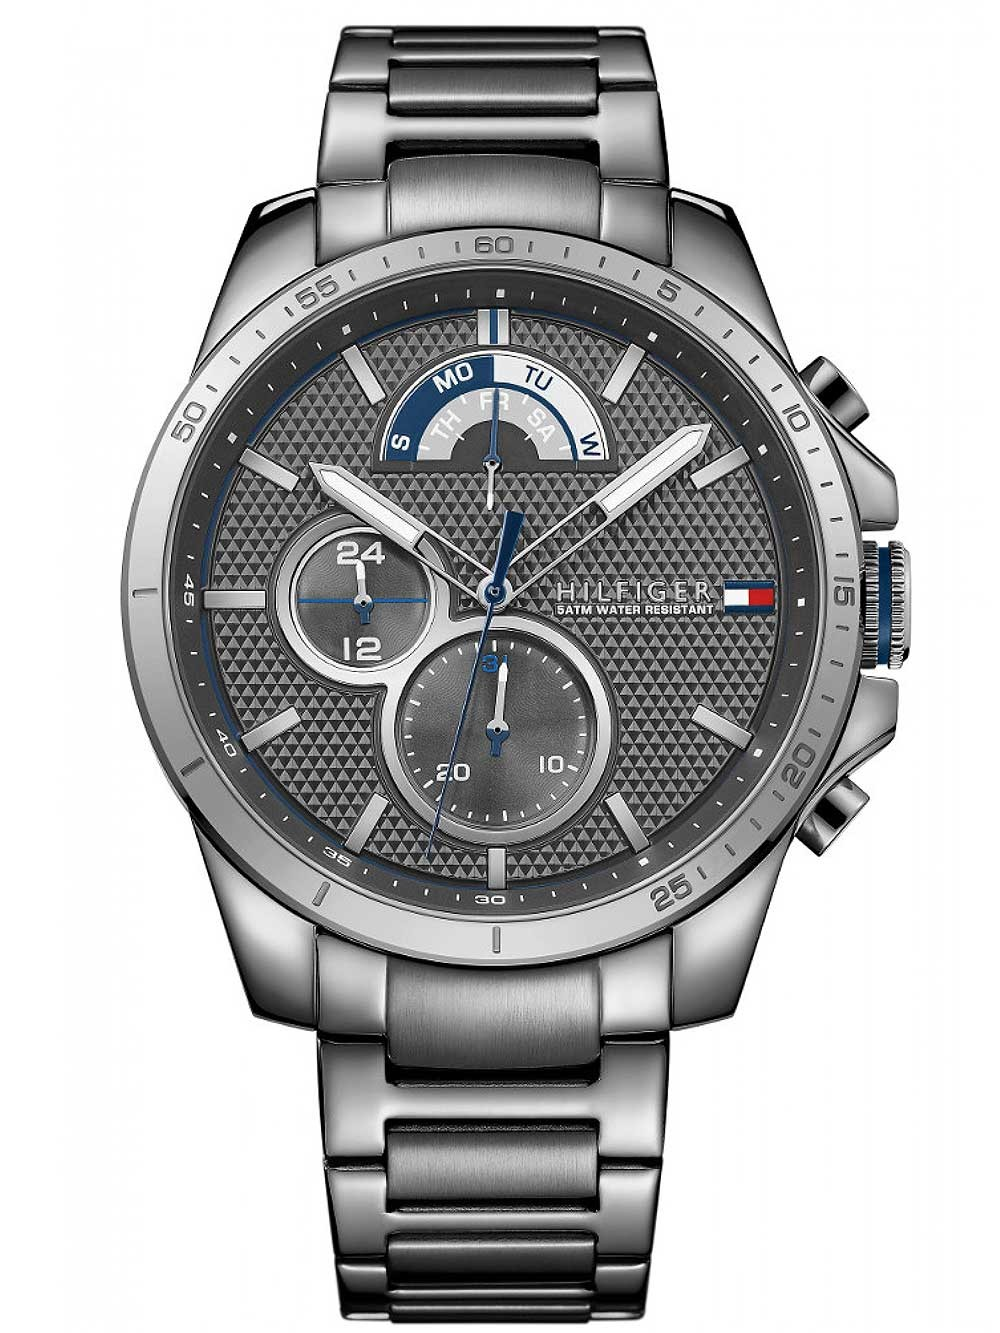 watches chrono12 tommy hilfiger 1791347 multif herren. Black Bedroom Furniture Sets. Home Design Ideas